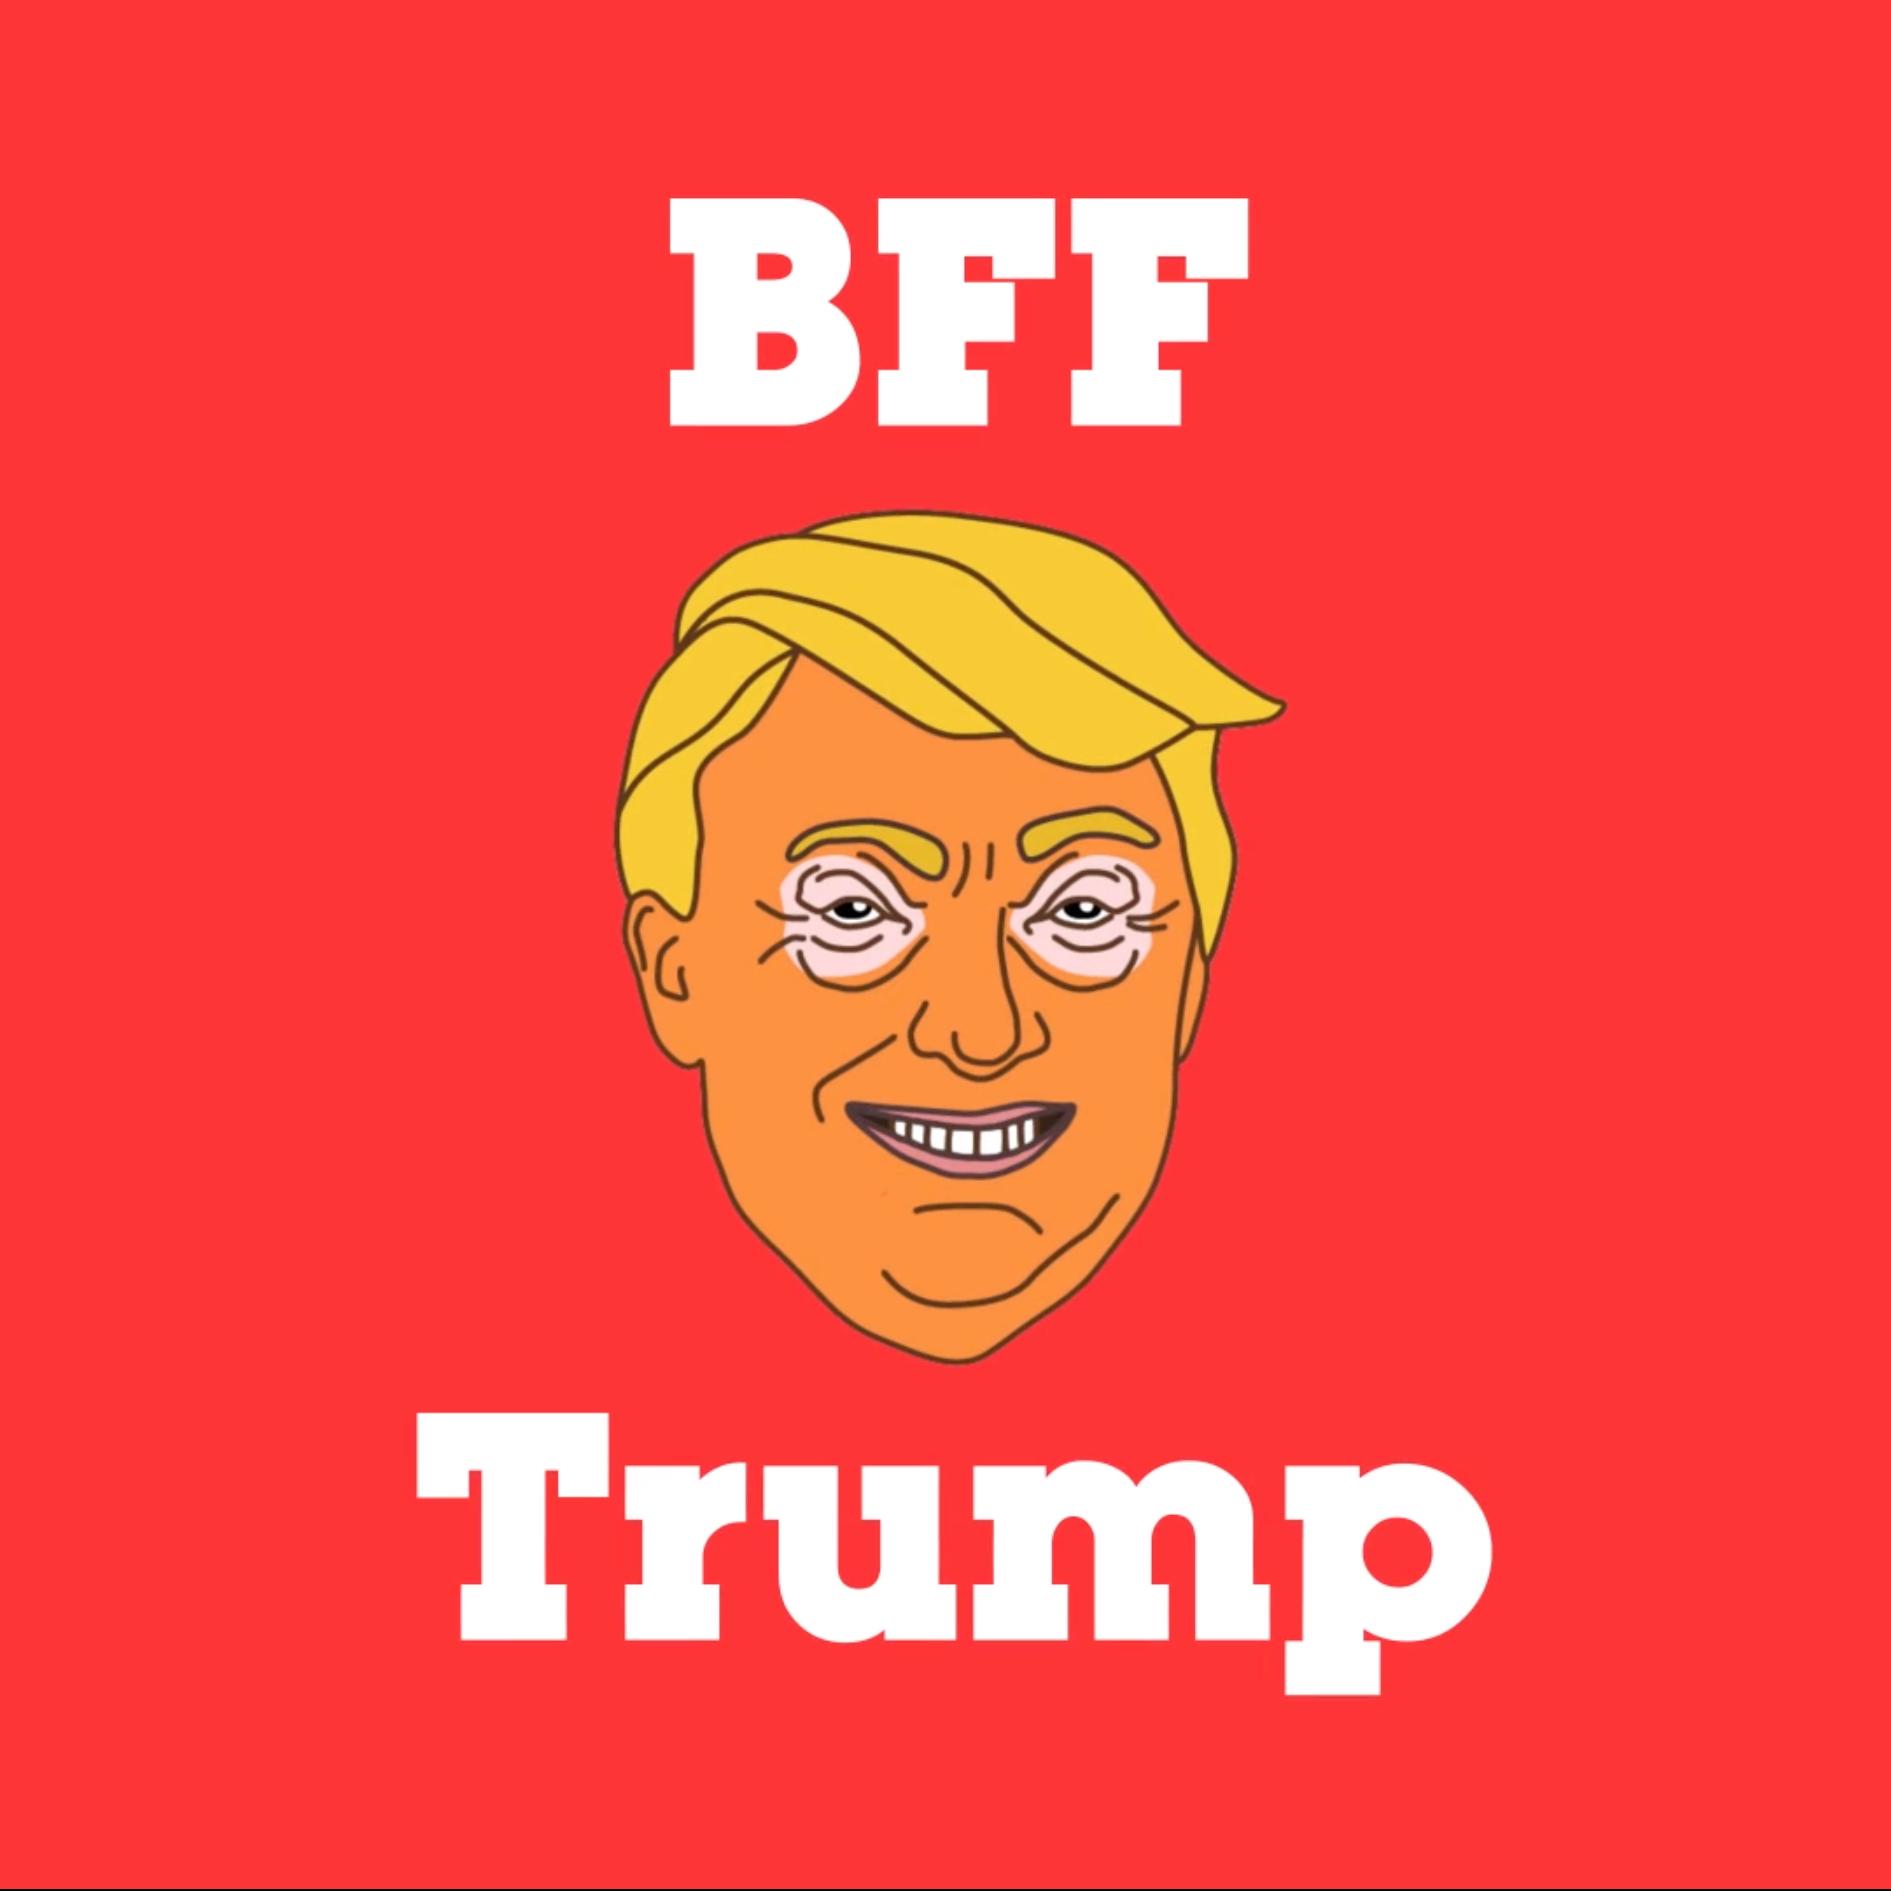 BFF TRUMP - CHATBOT